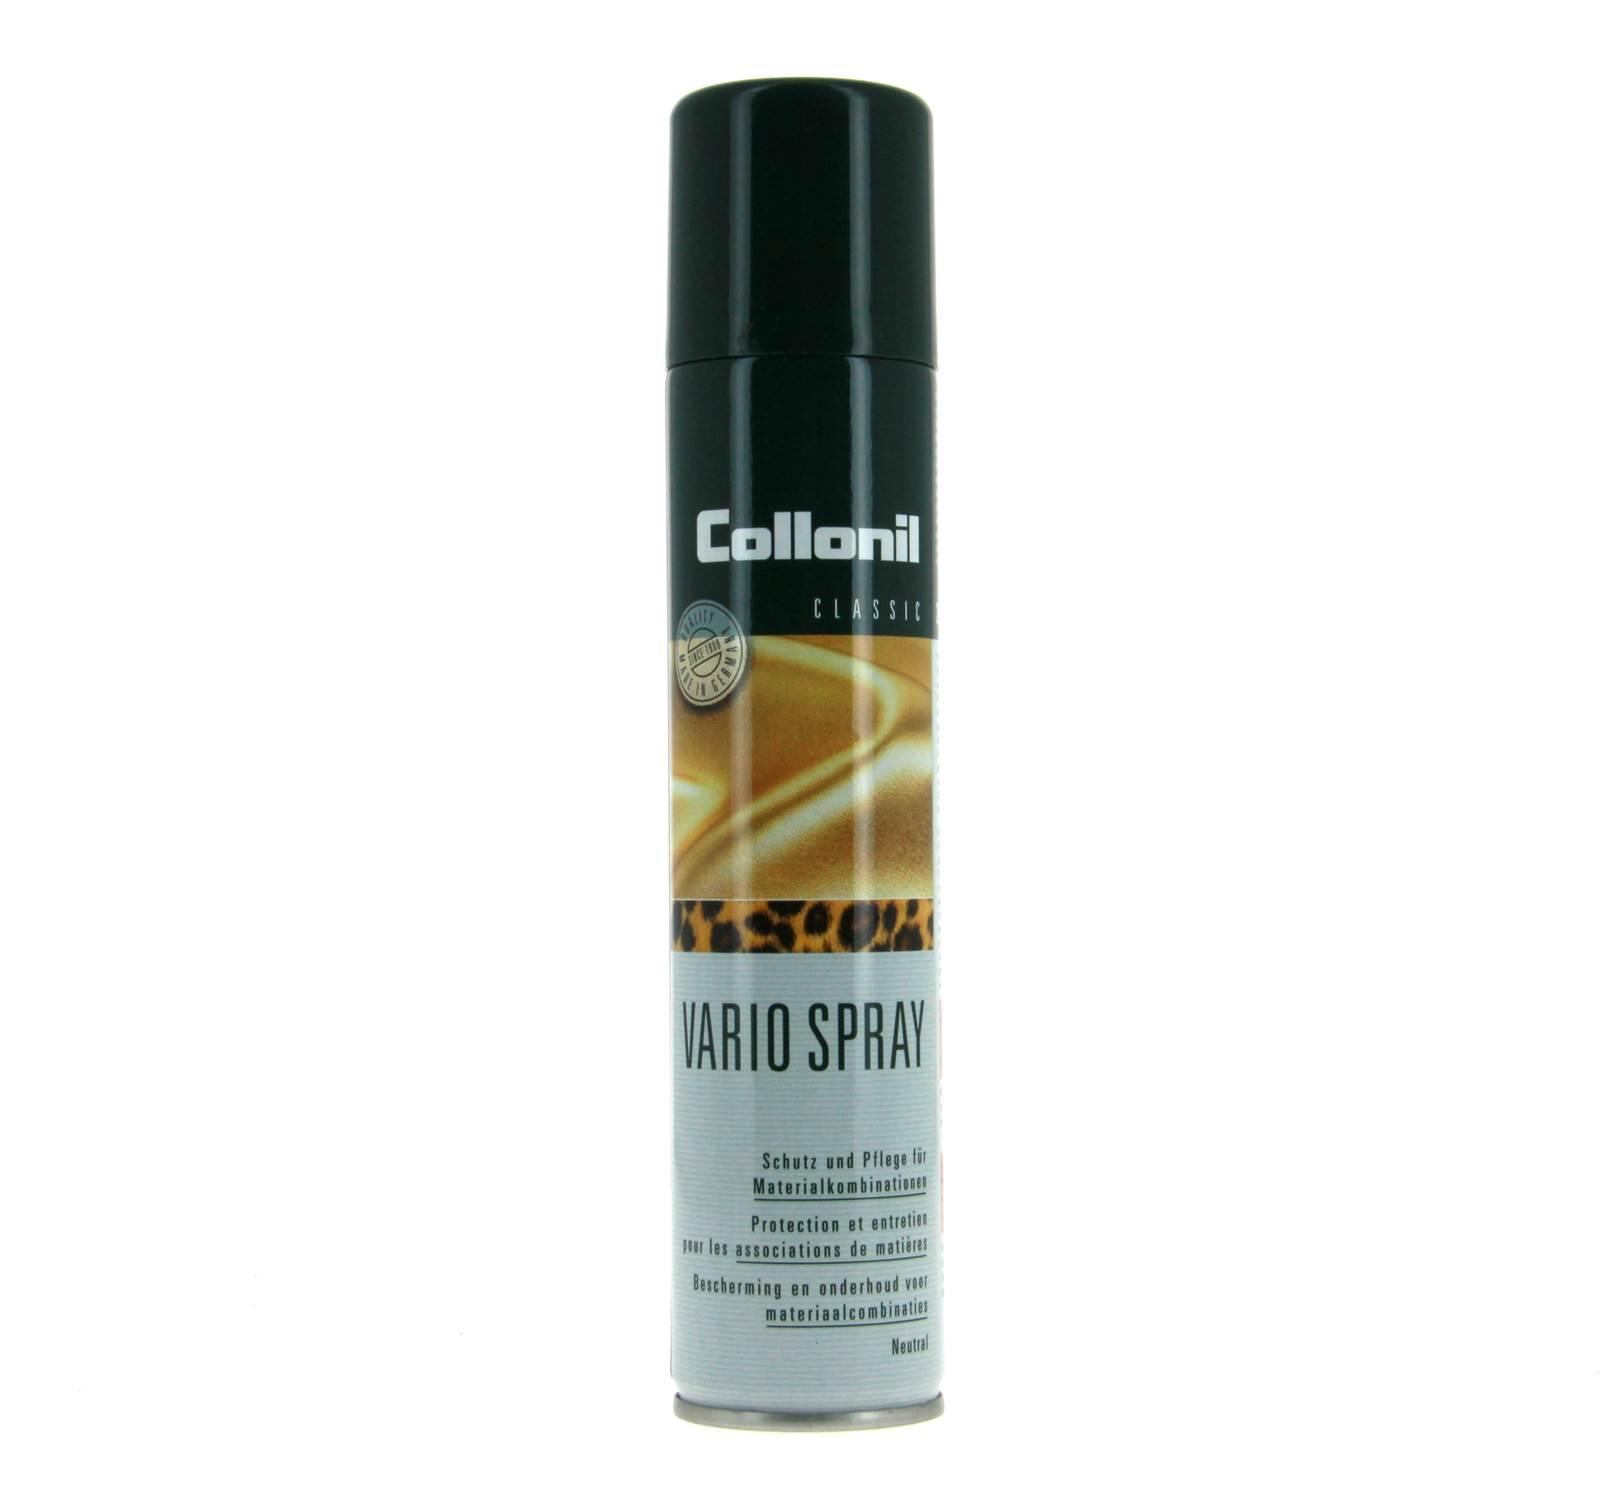 Collonil Spray VARIO